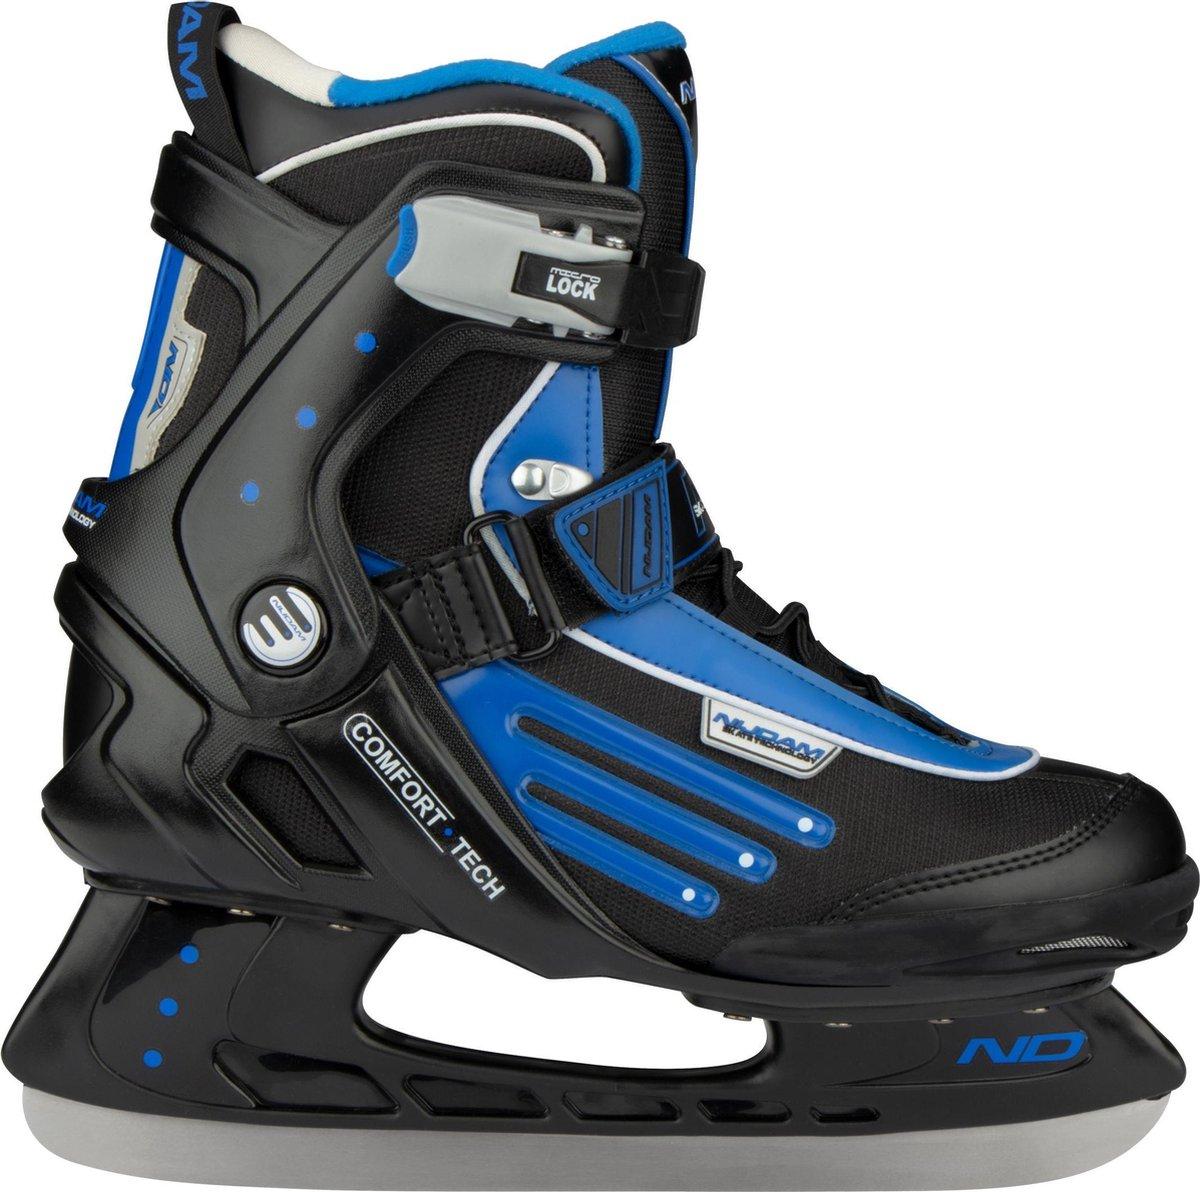 Nijdam IJshockeyschaats - Semi-Softboot - Zwart/Blauw/Zilver - 43